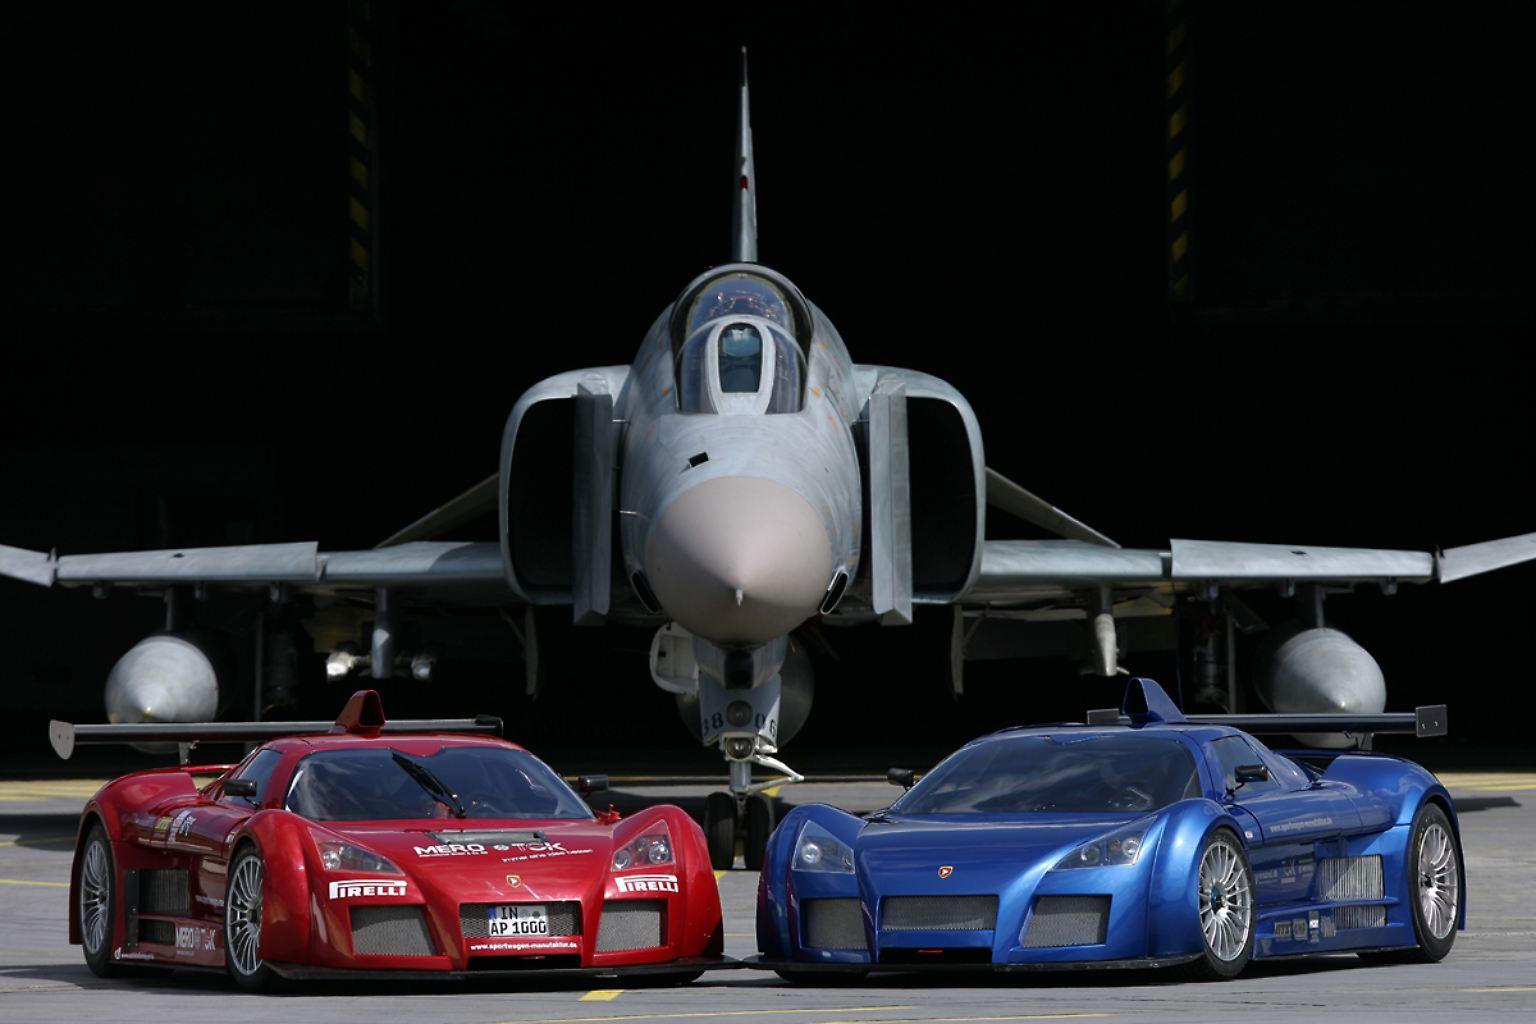 2_Apollos_(Prototype)_with_F-4_Phantom.jpg